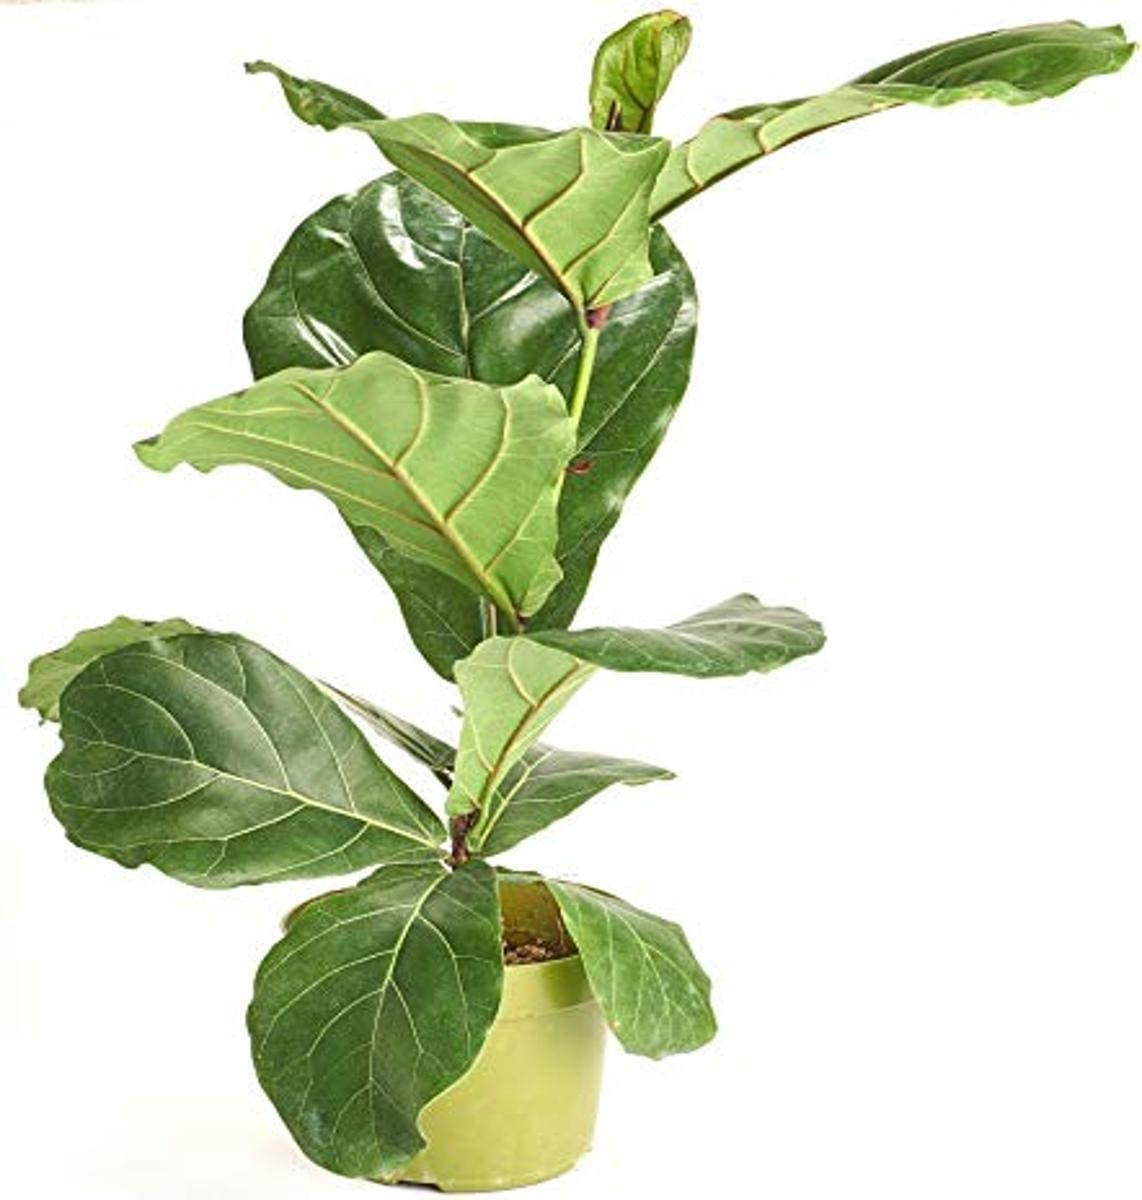 Shop Sale price Succulents Fiddle-Leaf Fig 'Ficus in Lyrata' House Plant 2021 new